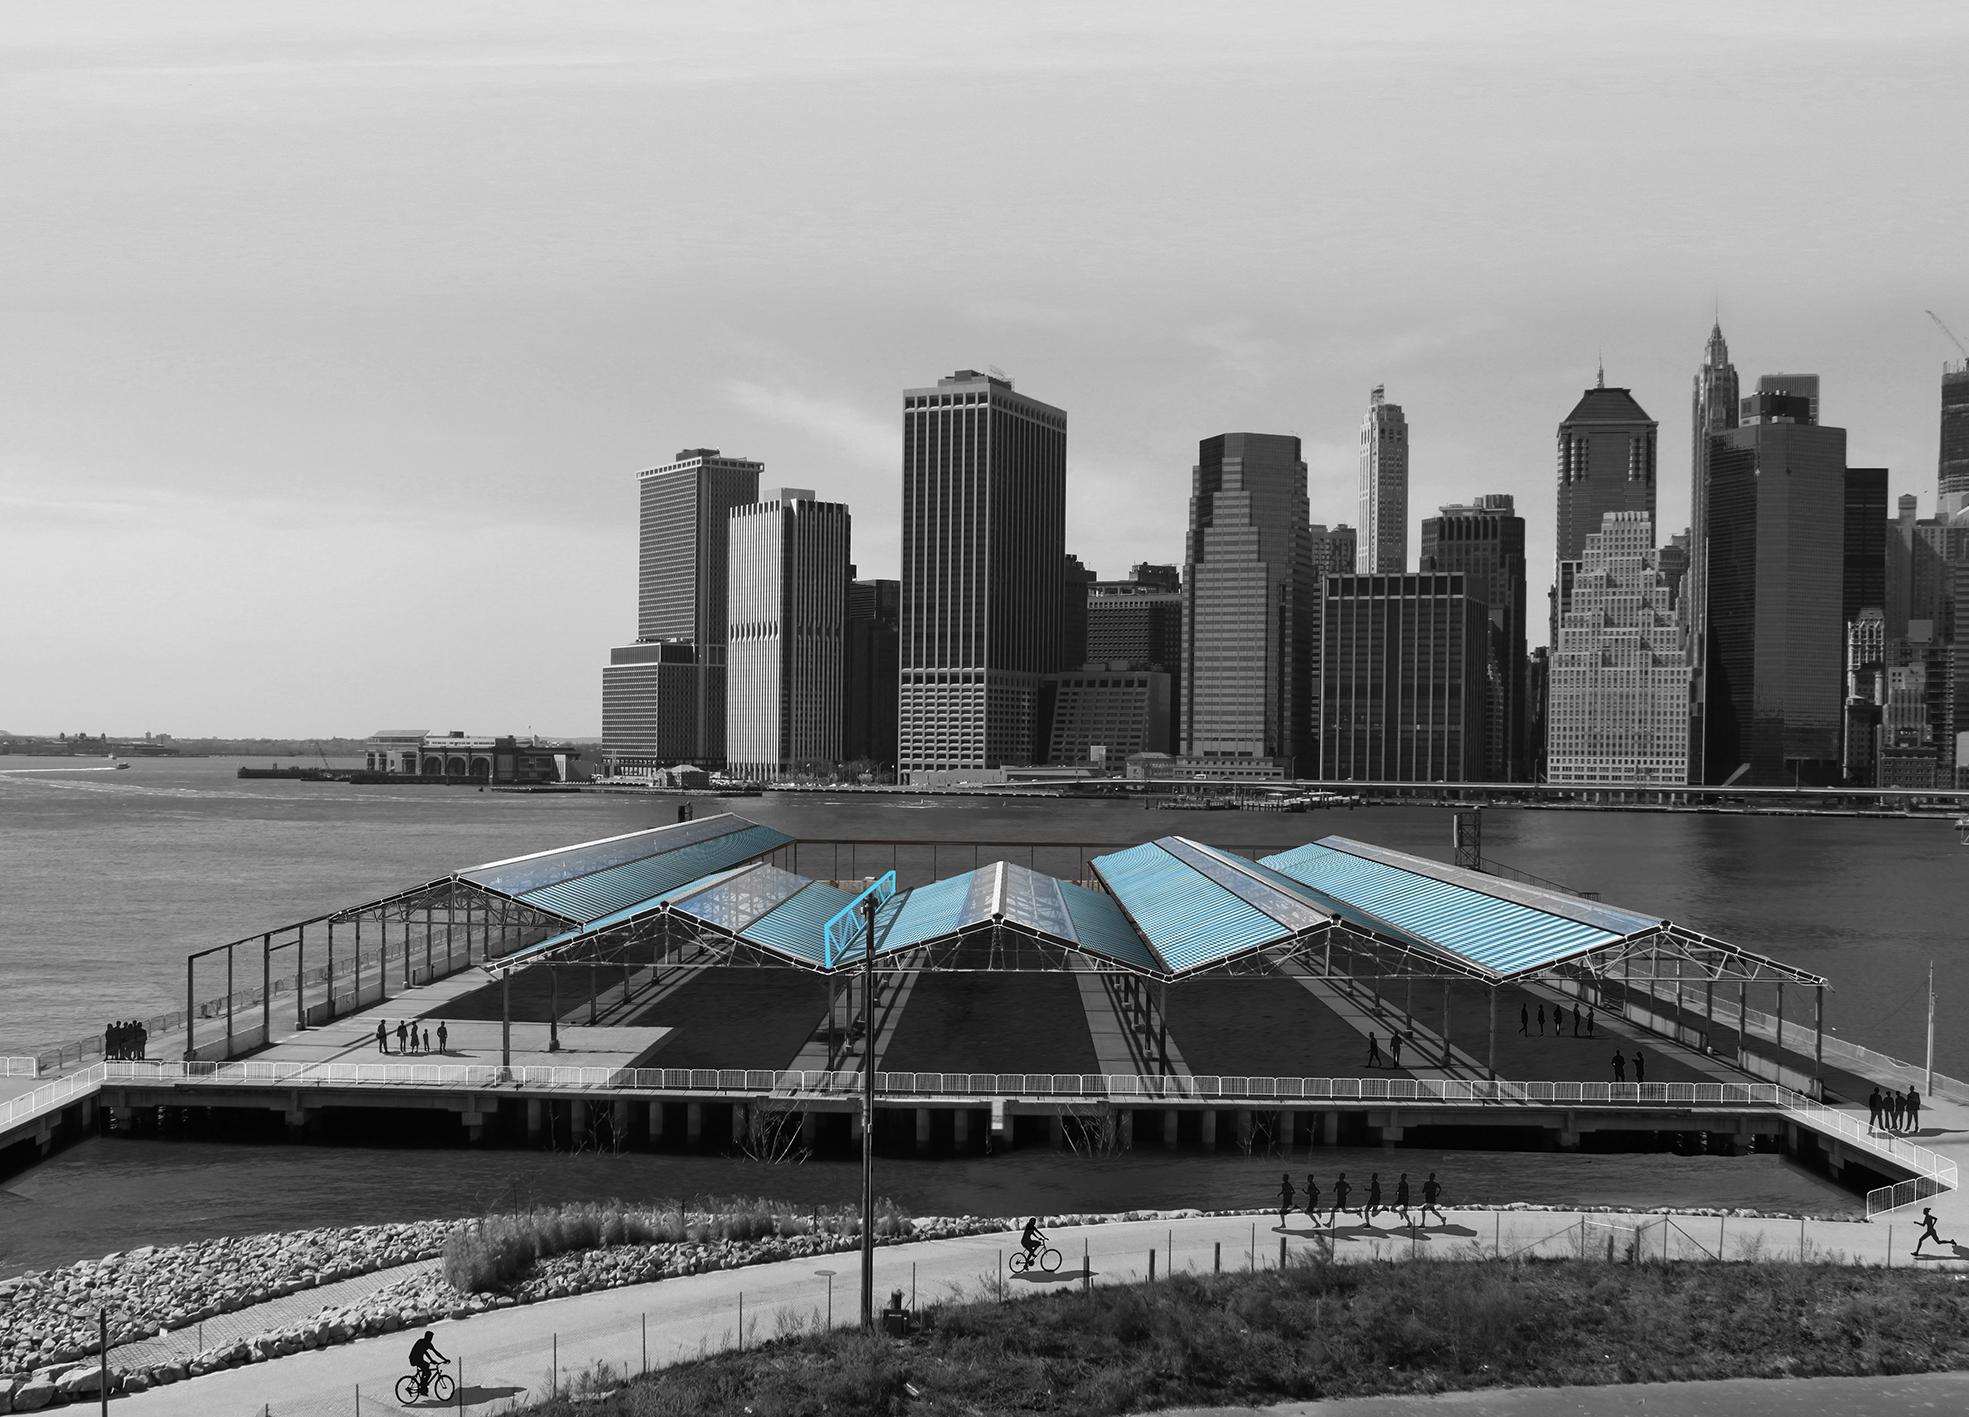 Brooklyn Bridge Park Pier 2 / NYC